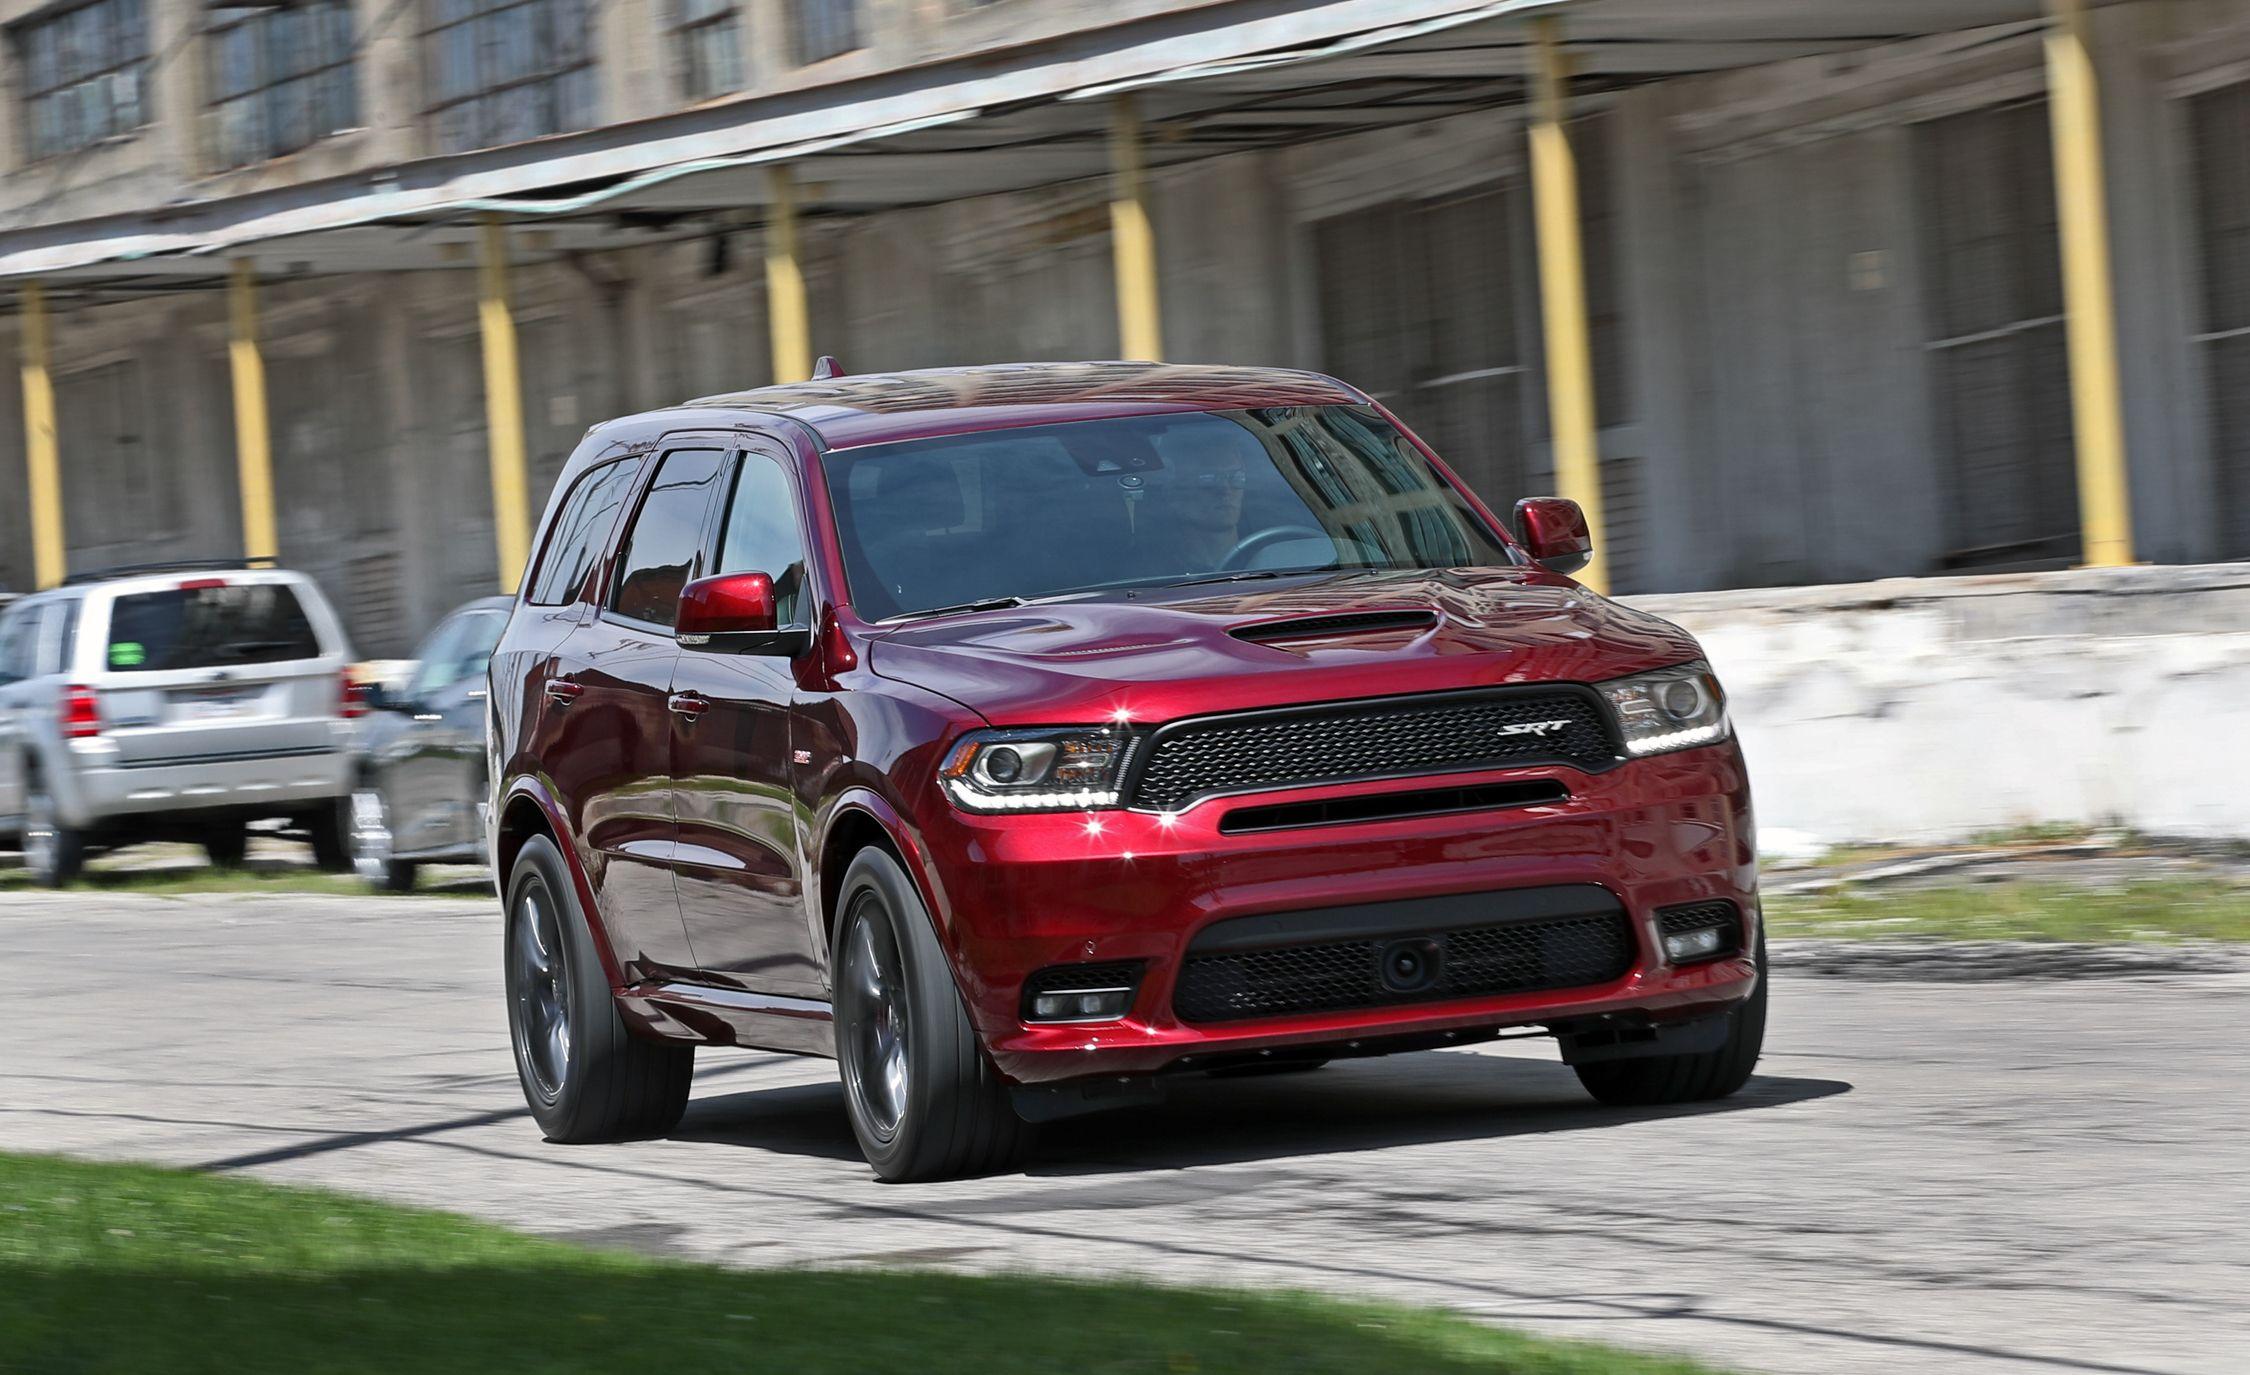 2019 Dodge Durango Srt Reviews Price Photos And Specs Car Driver